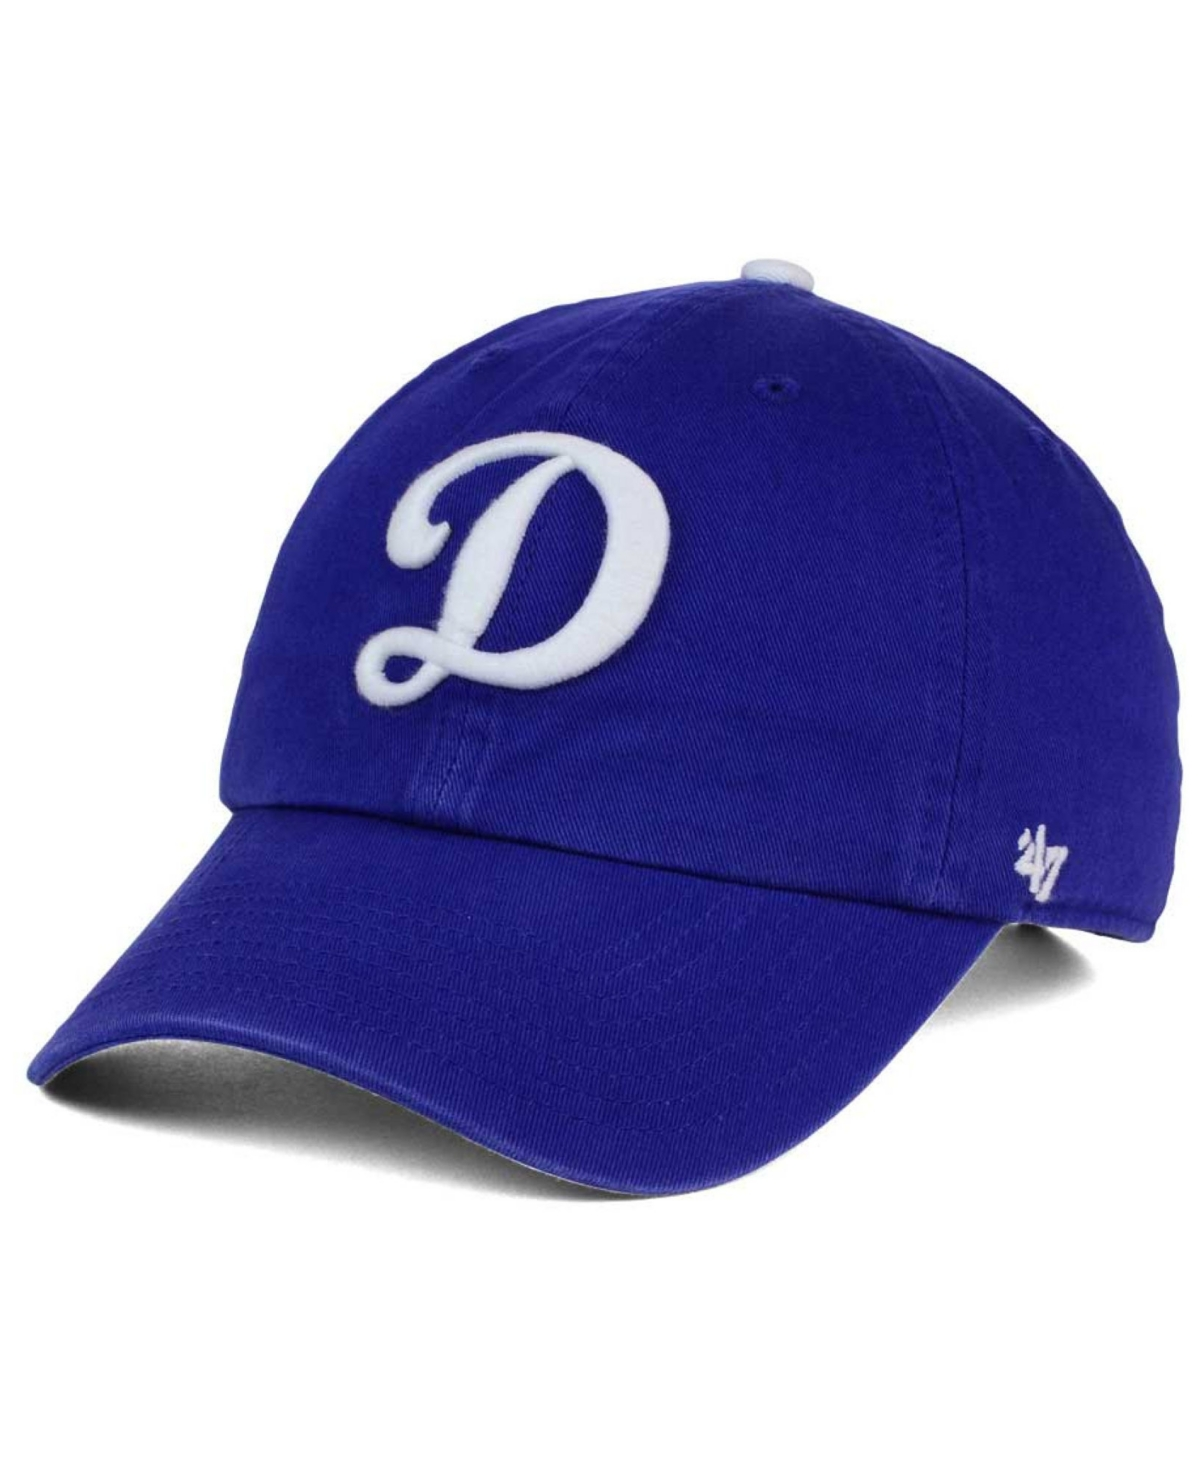 47 Brand Los Angeles Dodgers Core Clean Up Cap